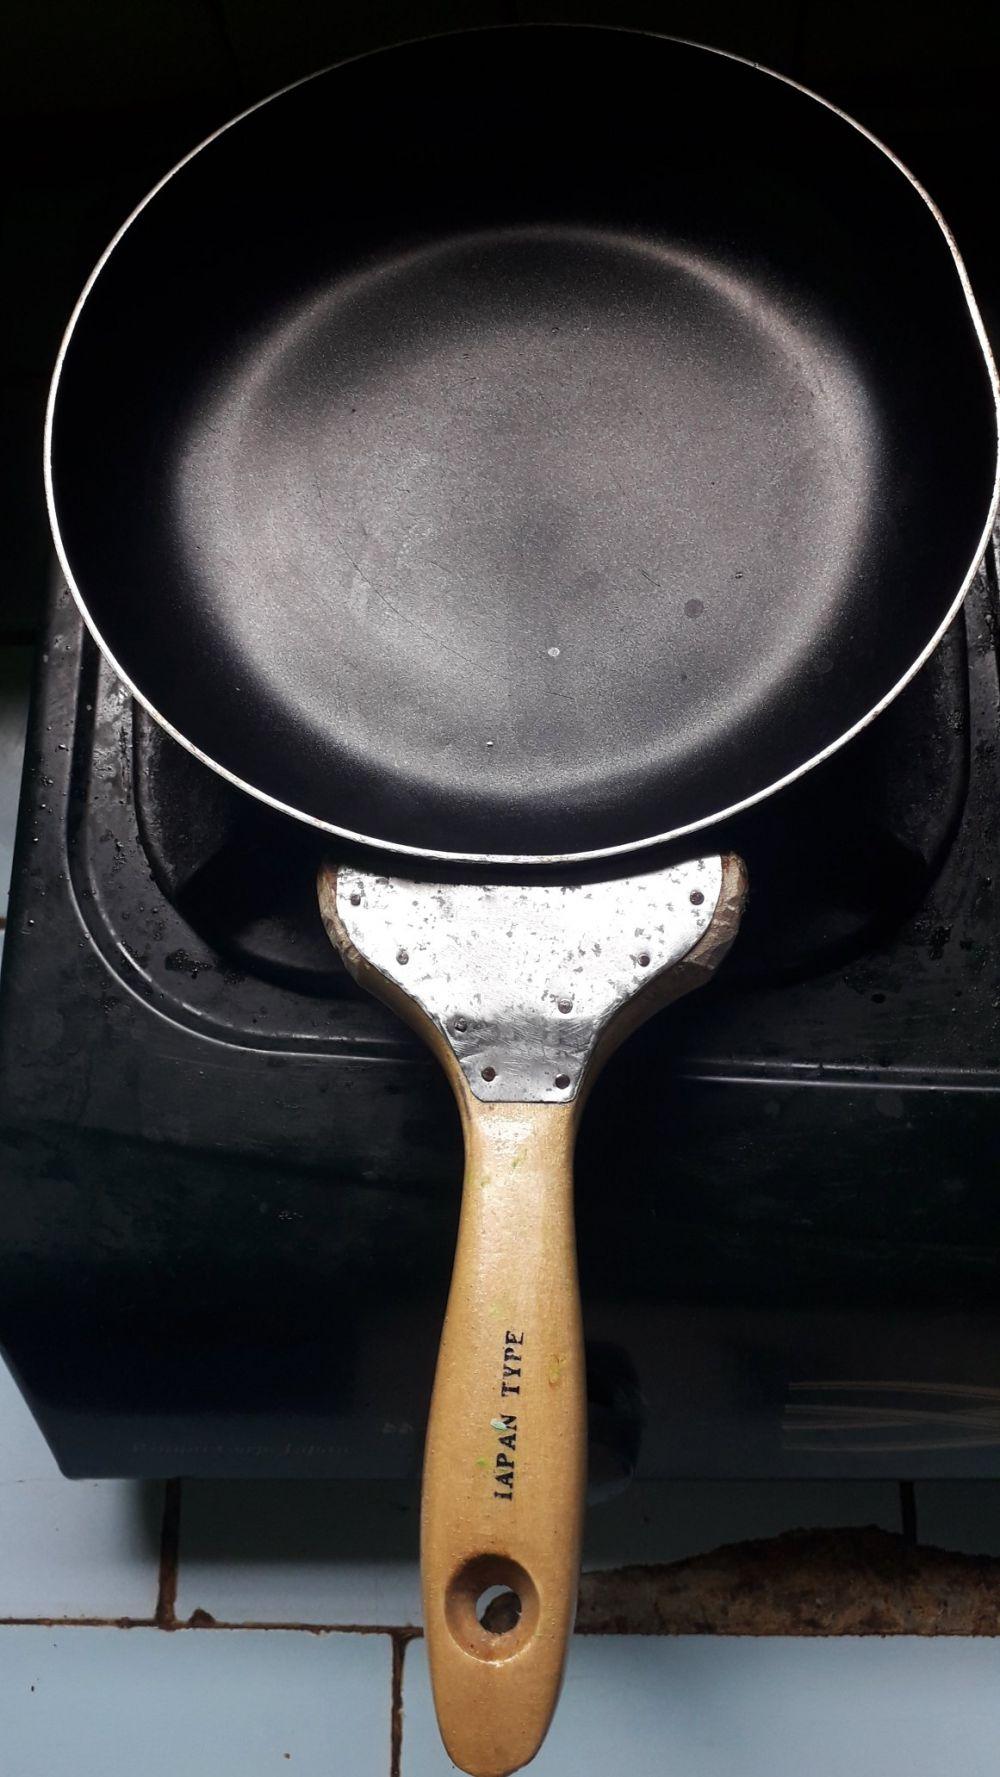 peralatan masak lucu Twitter